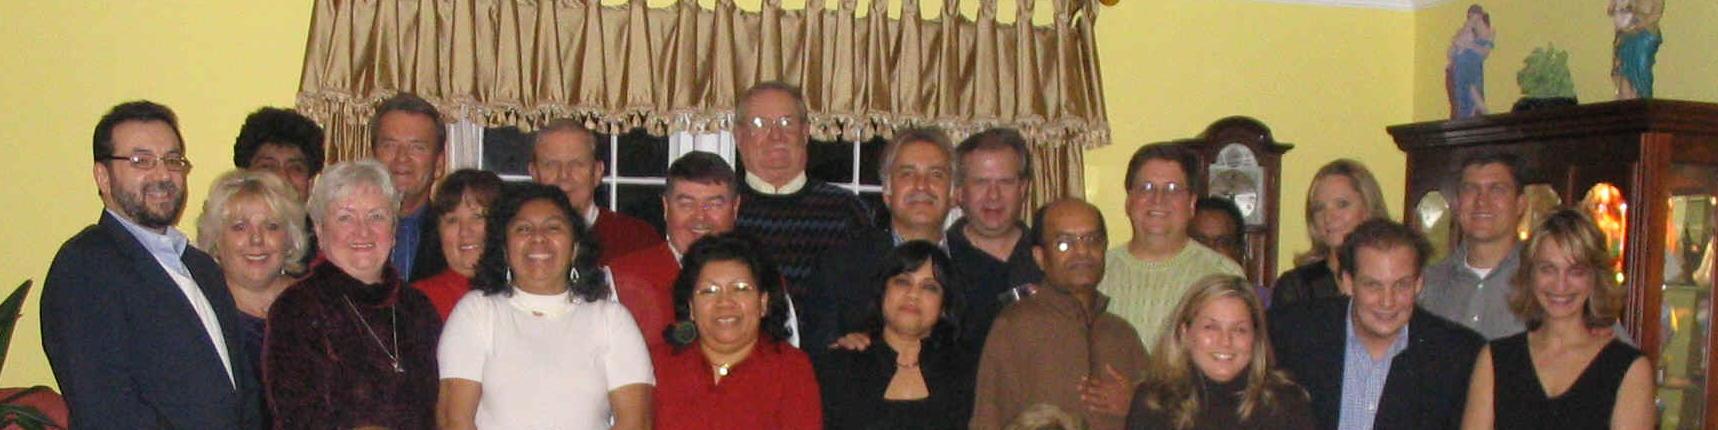 EWA_staff_2006.jpg